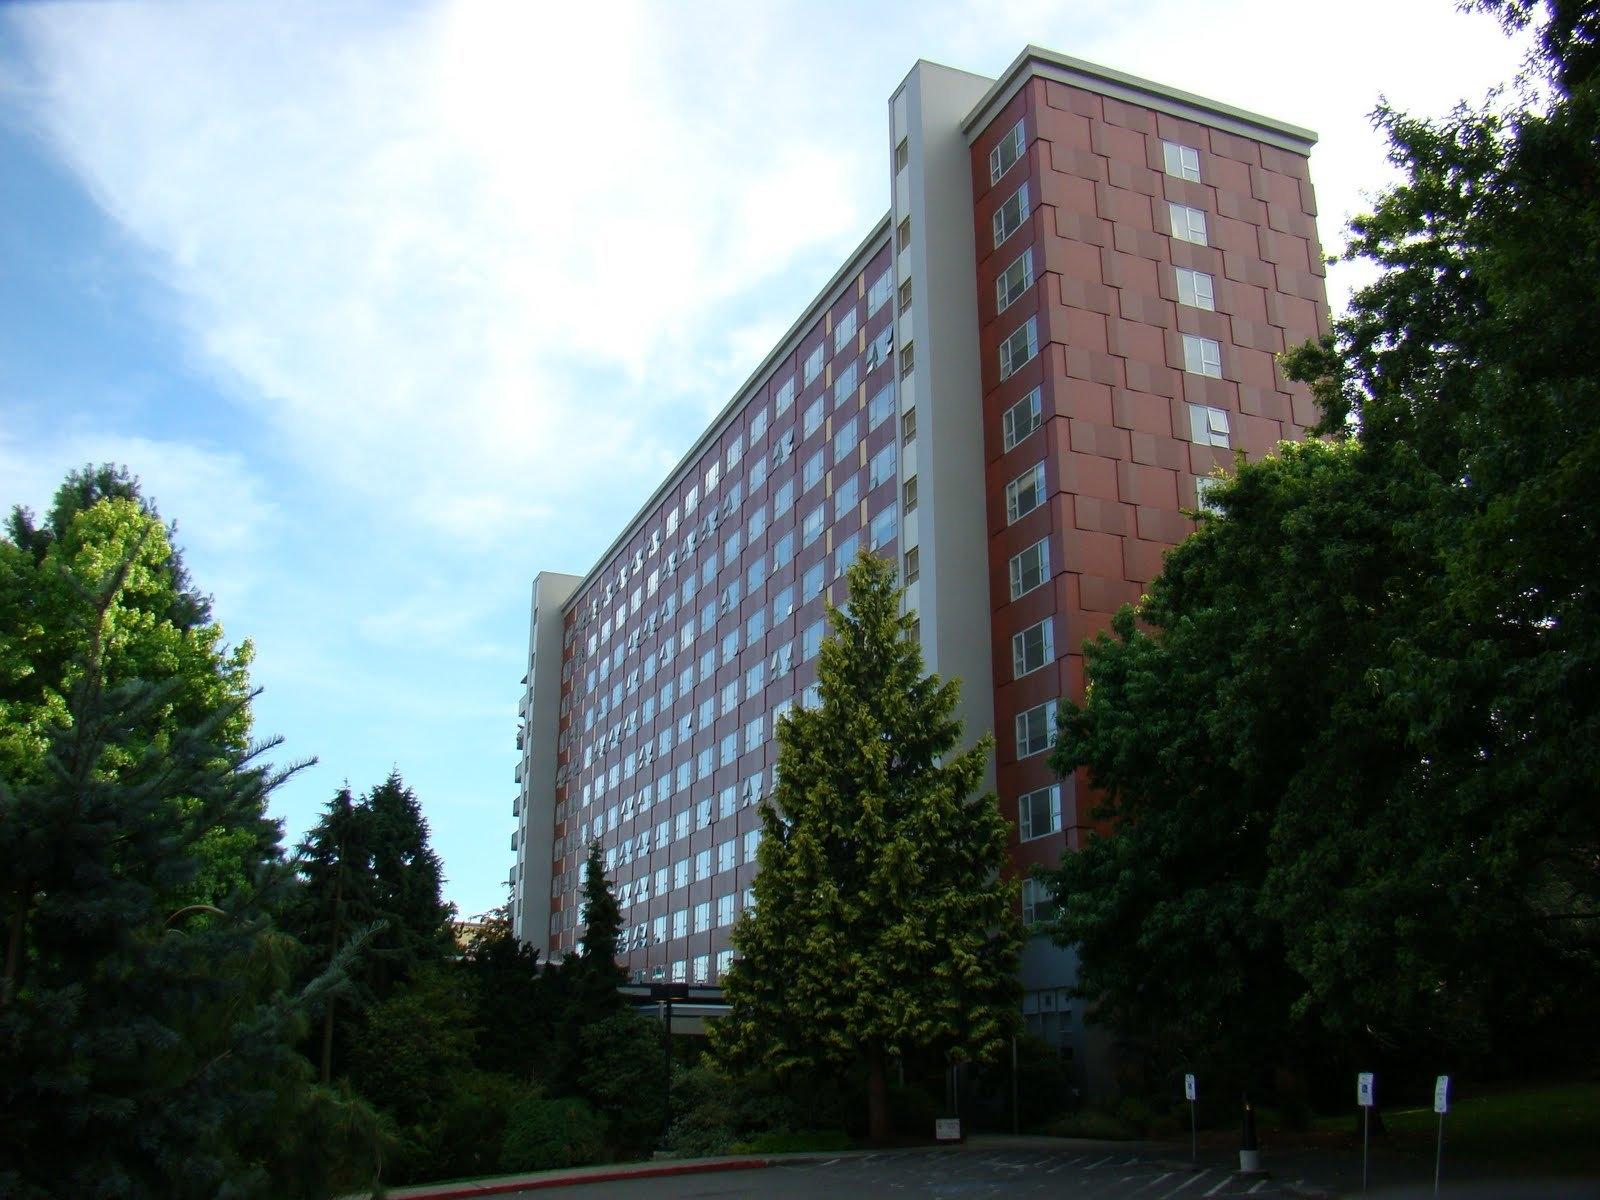 Campion Hall - Residences - Housing And Residence Life - Seattle Seattle U Calendar 2019